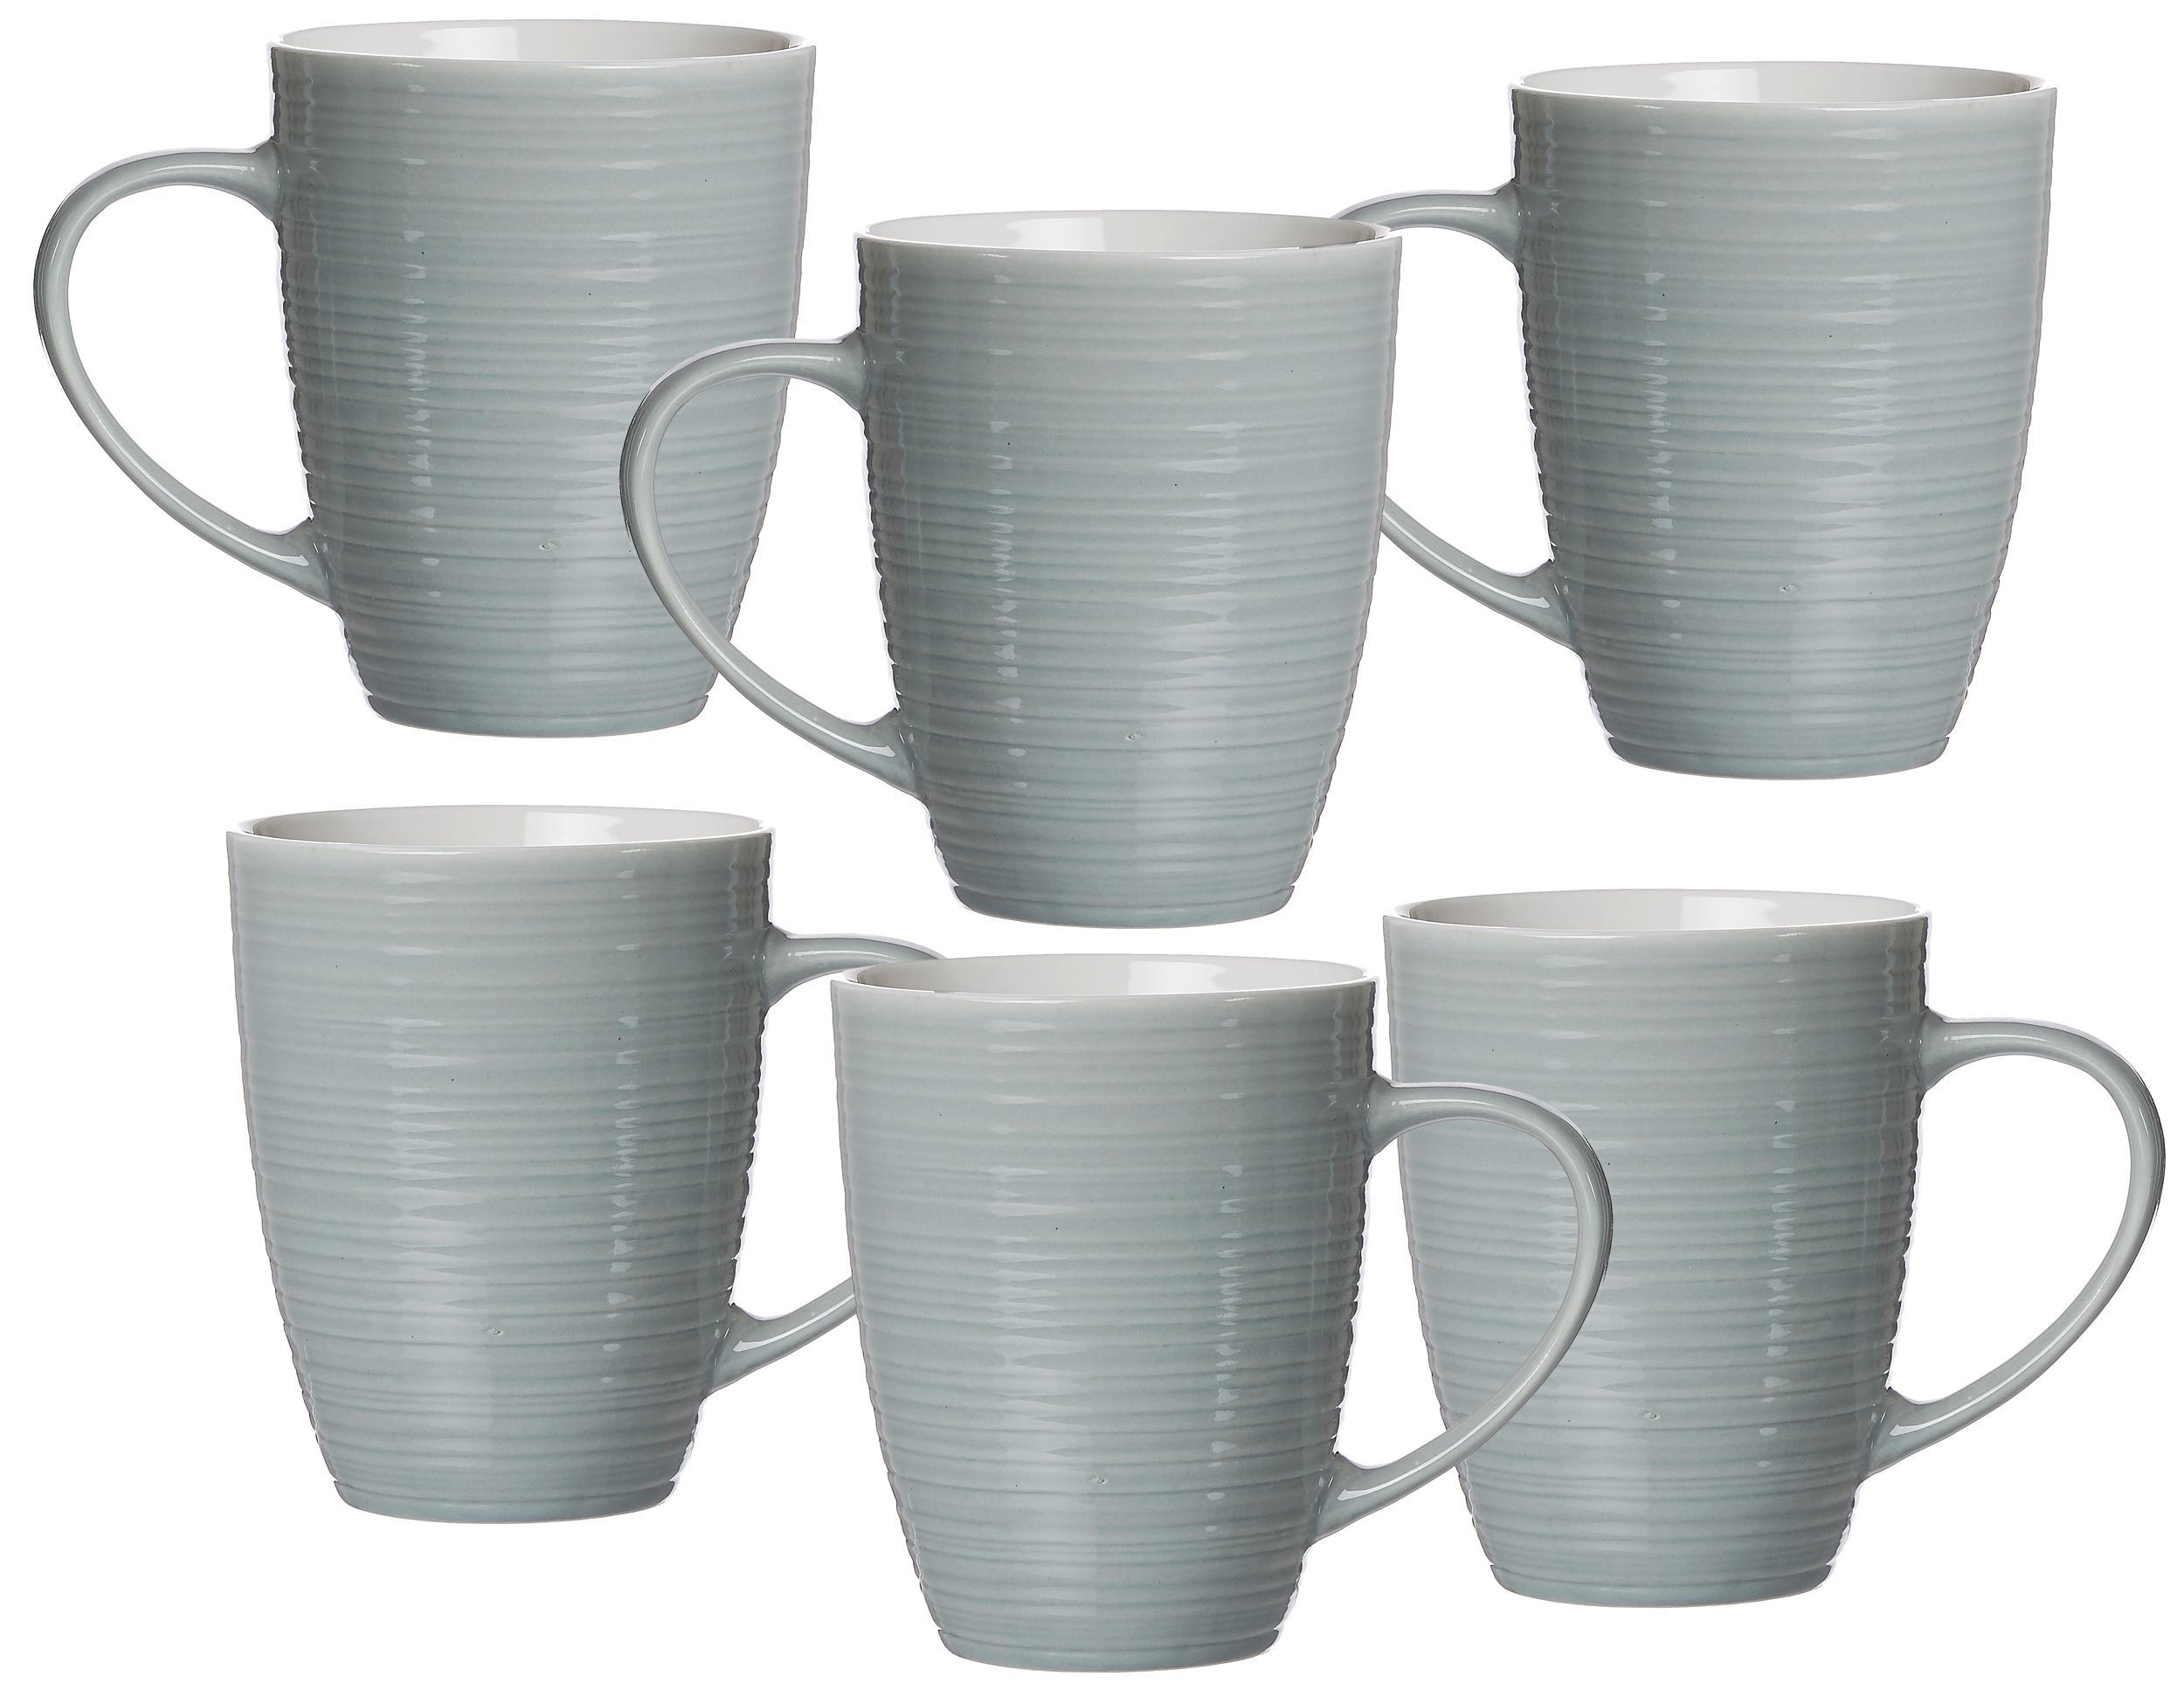 Ritzenhoff & Breker Becher Suomi, (Set, 6 tlg.), 6-teilig blau Tassen Geschirr, Porzellan Tischaccessoires Haushaltswaren